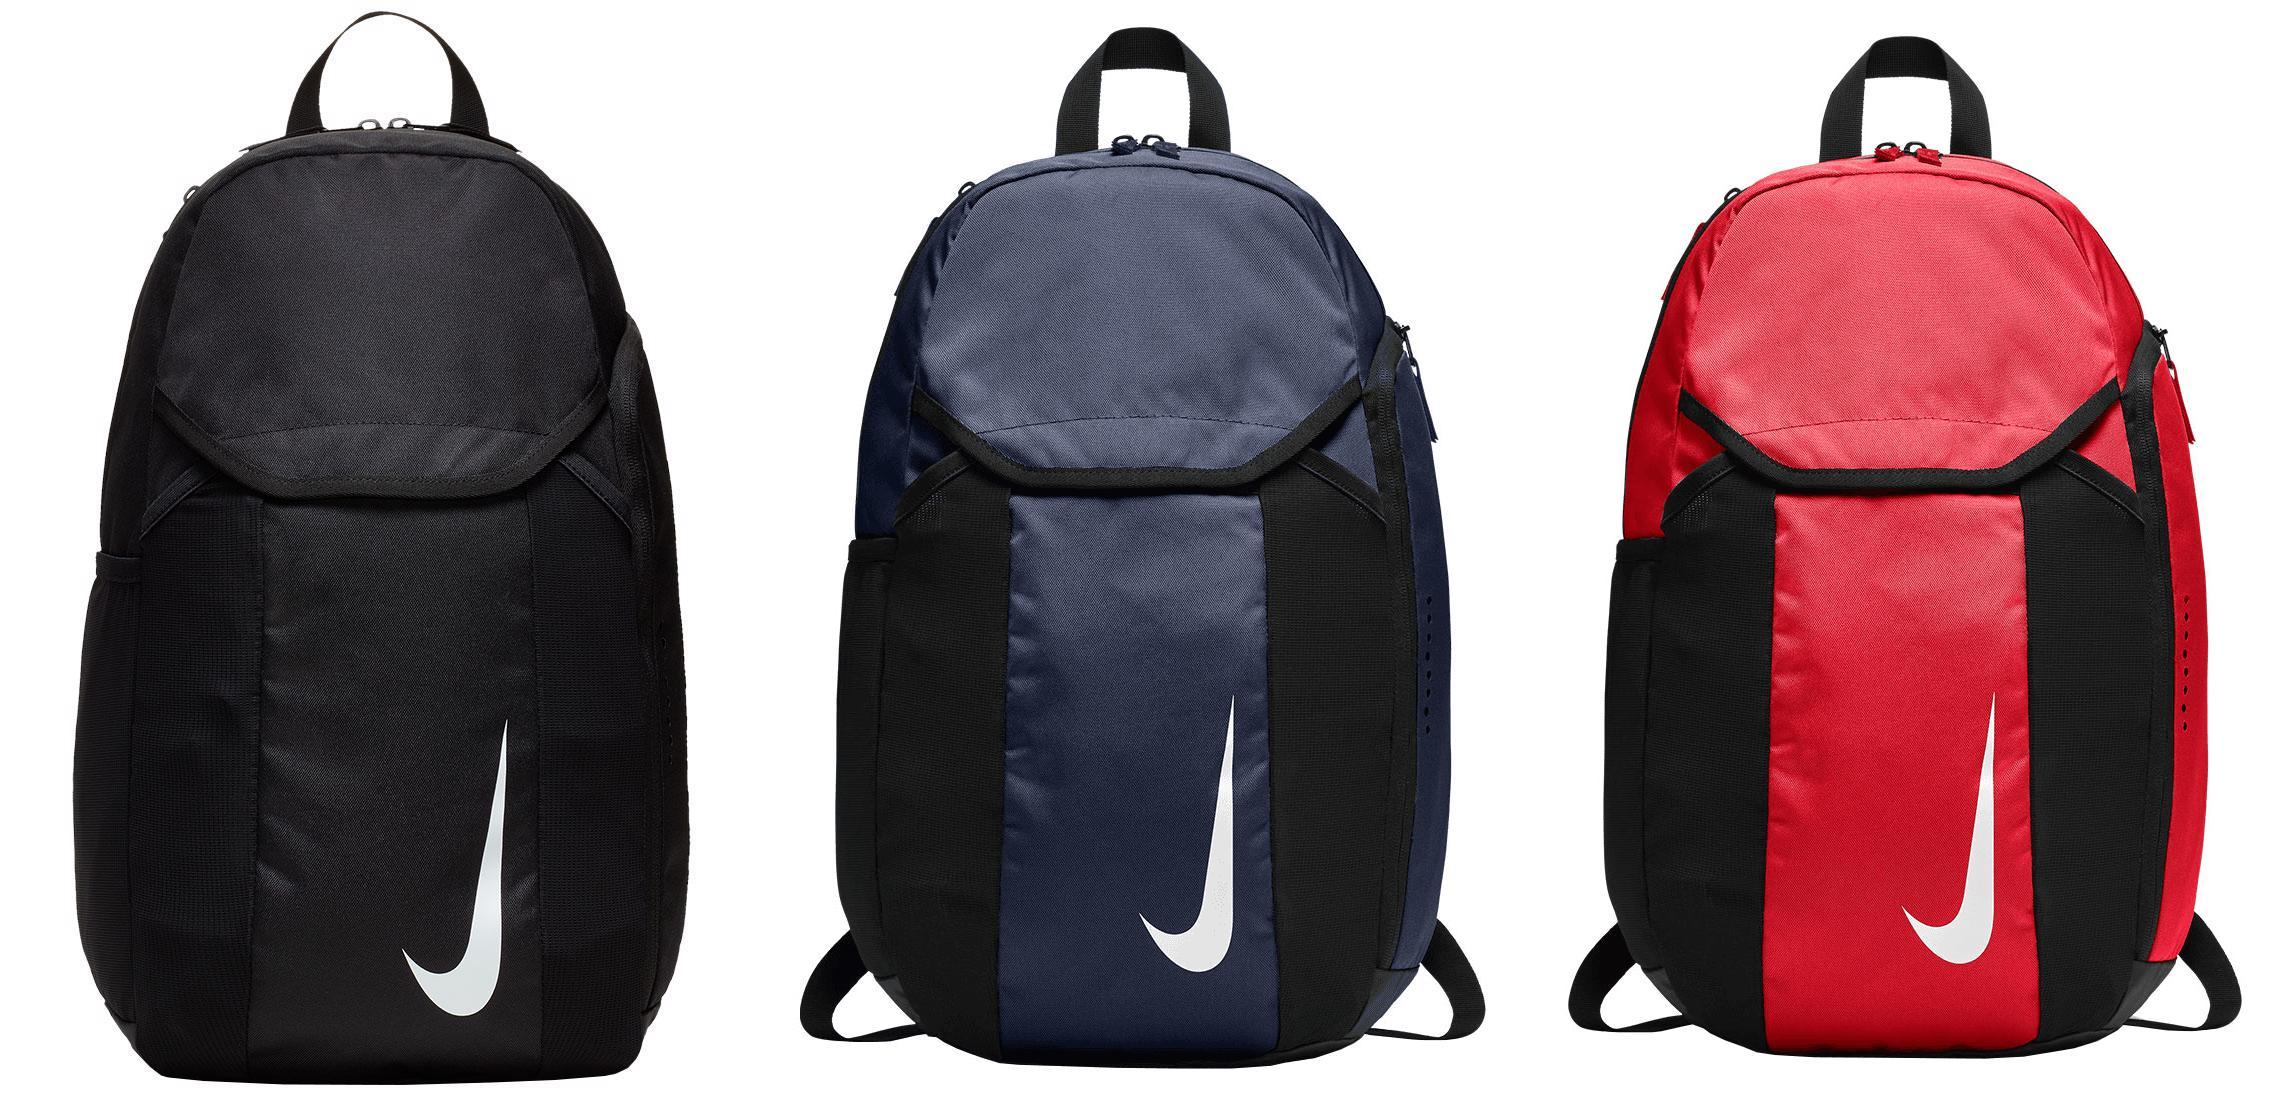 Nike Rucksack Team Club in 3 Farben